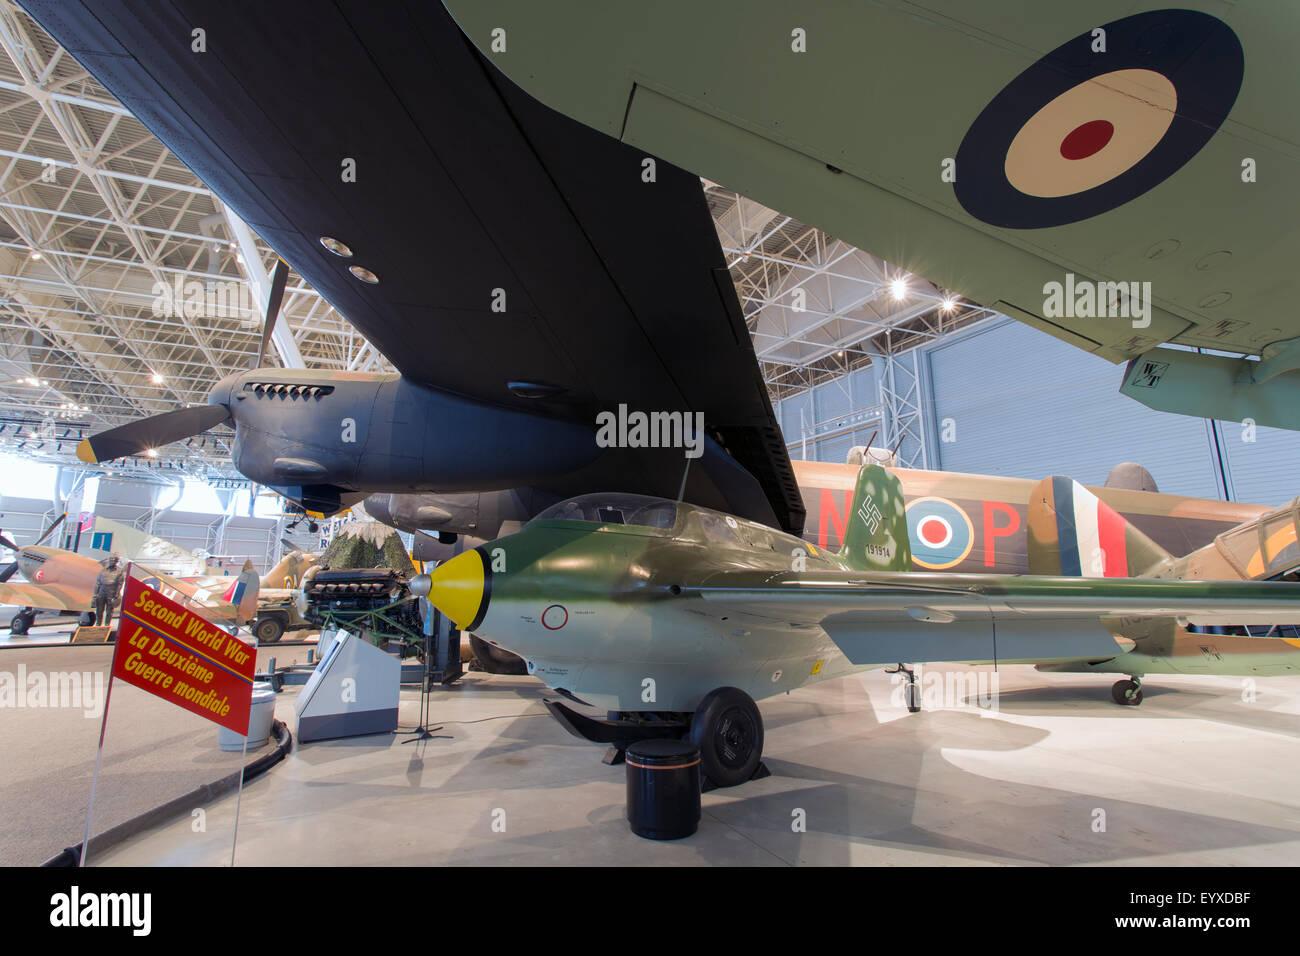 Canada,Ontario,Ottawa, Canada Aviation & Space Museum, Lancaster, Messerschmitt Me 163B-1a Komet - Stock Image